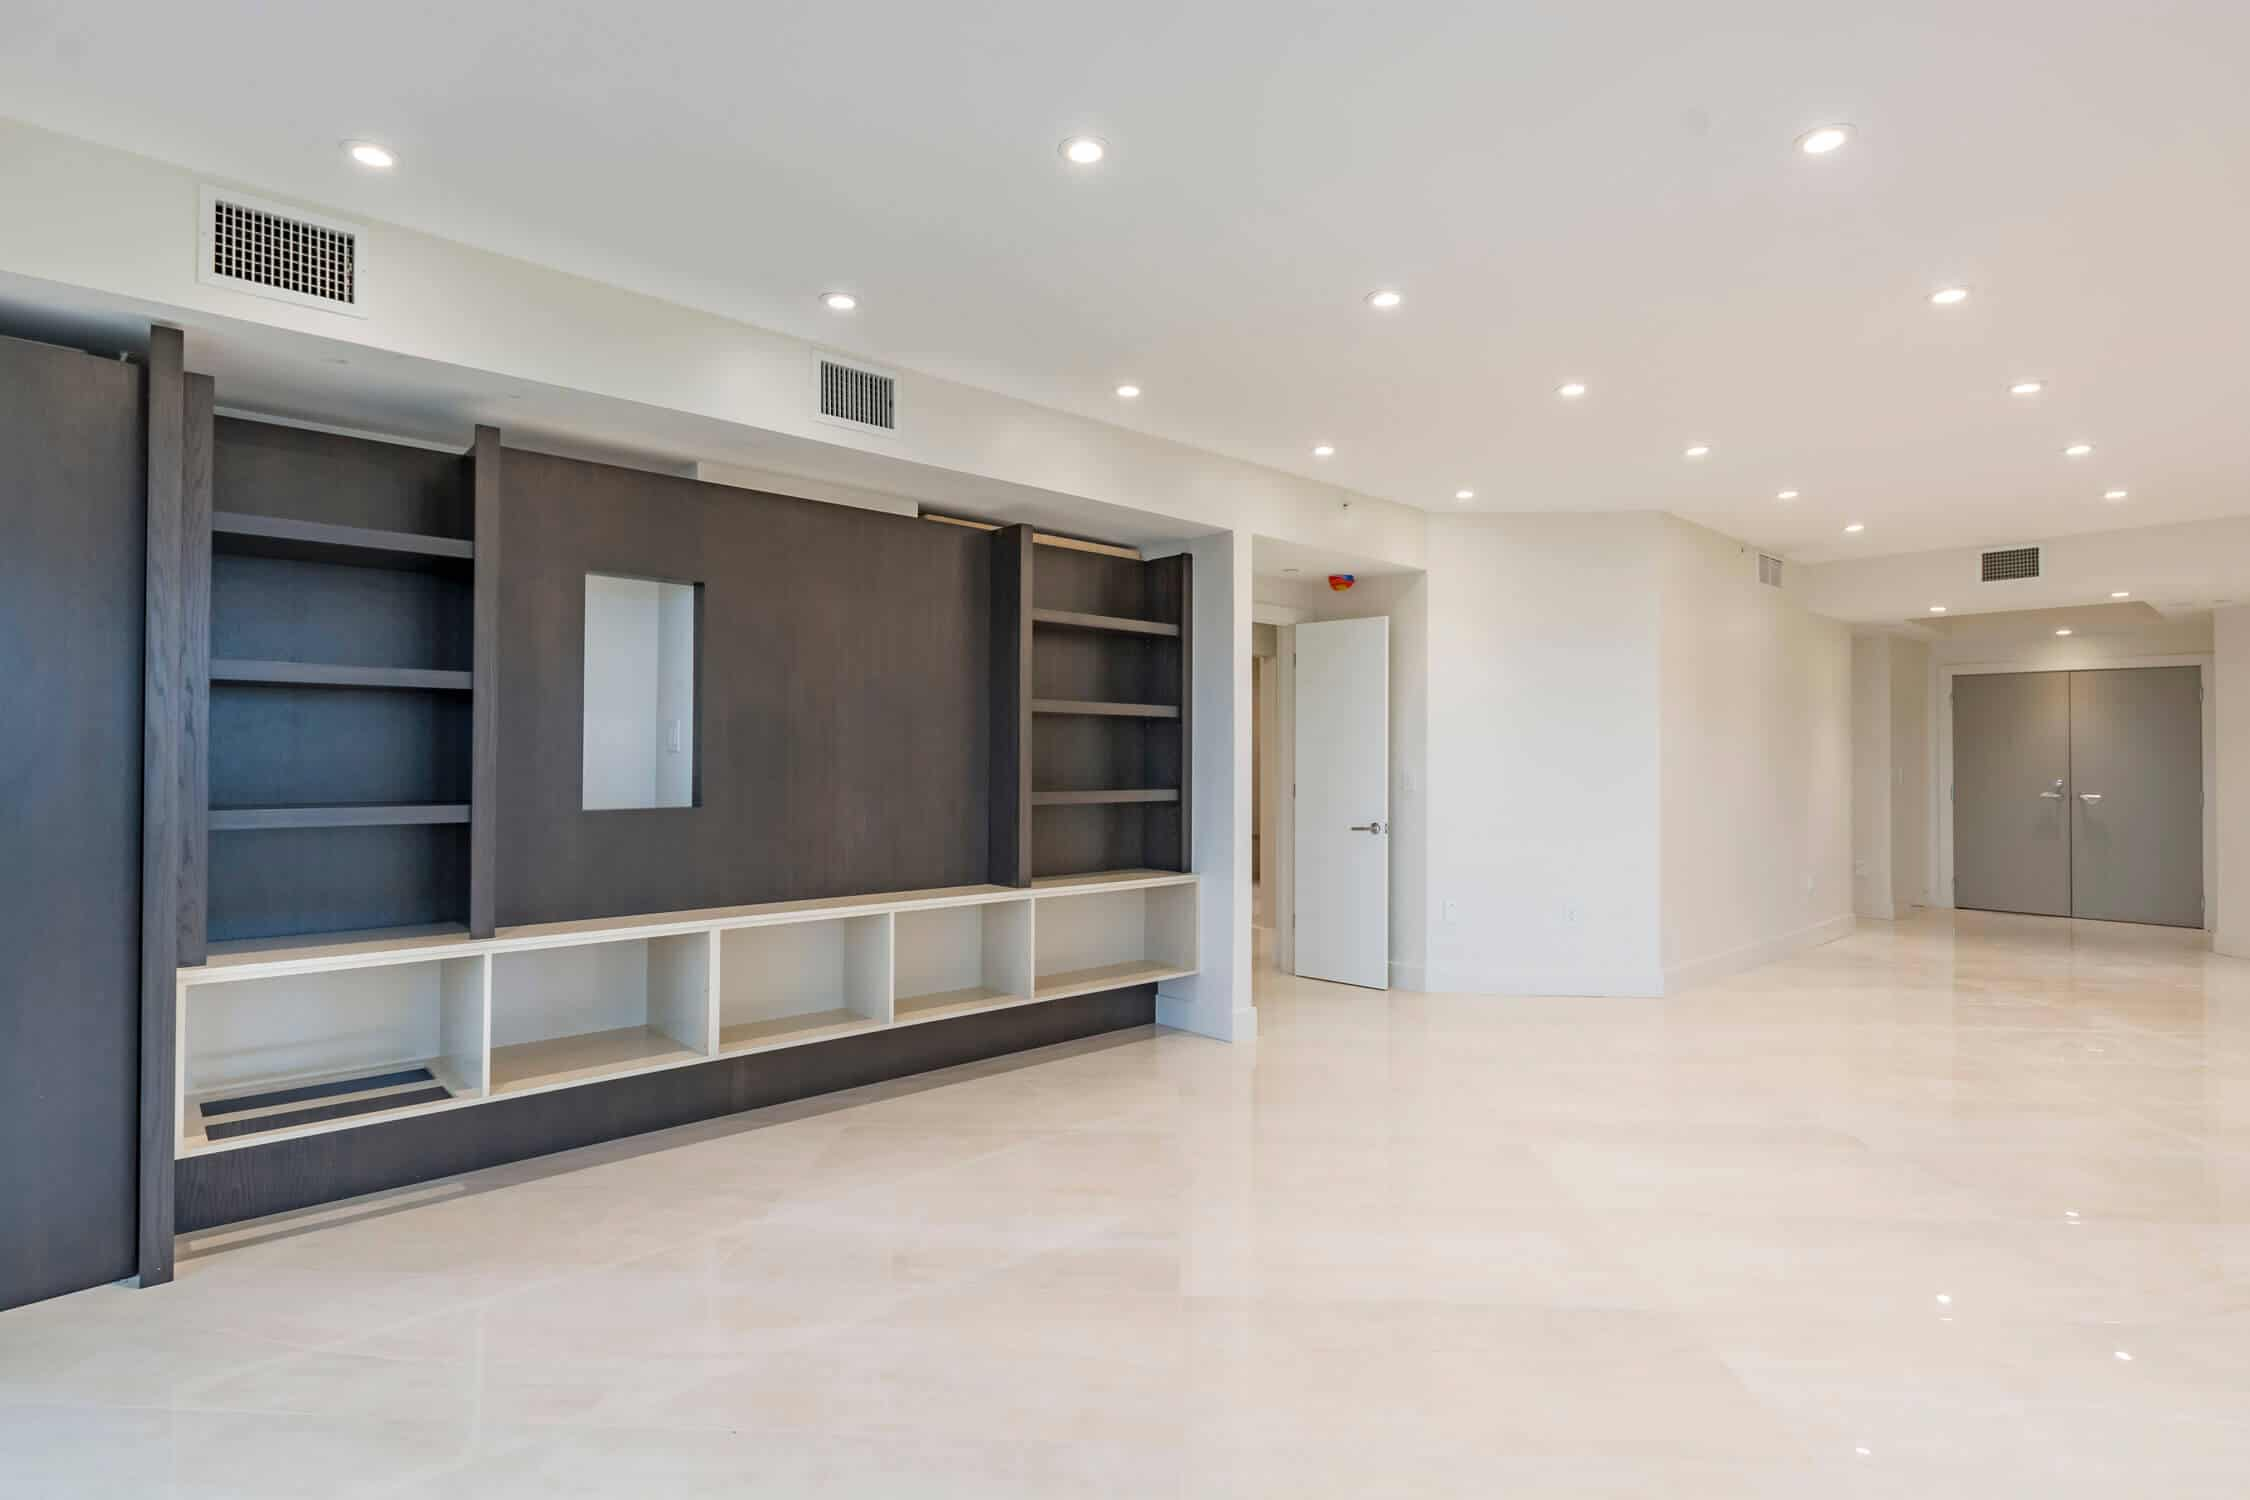 Custom Cabinetry in Condo Remodel